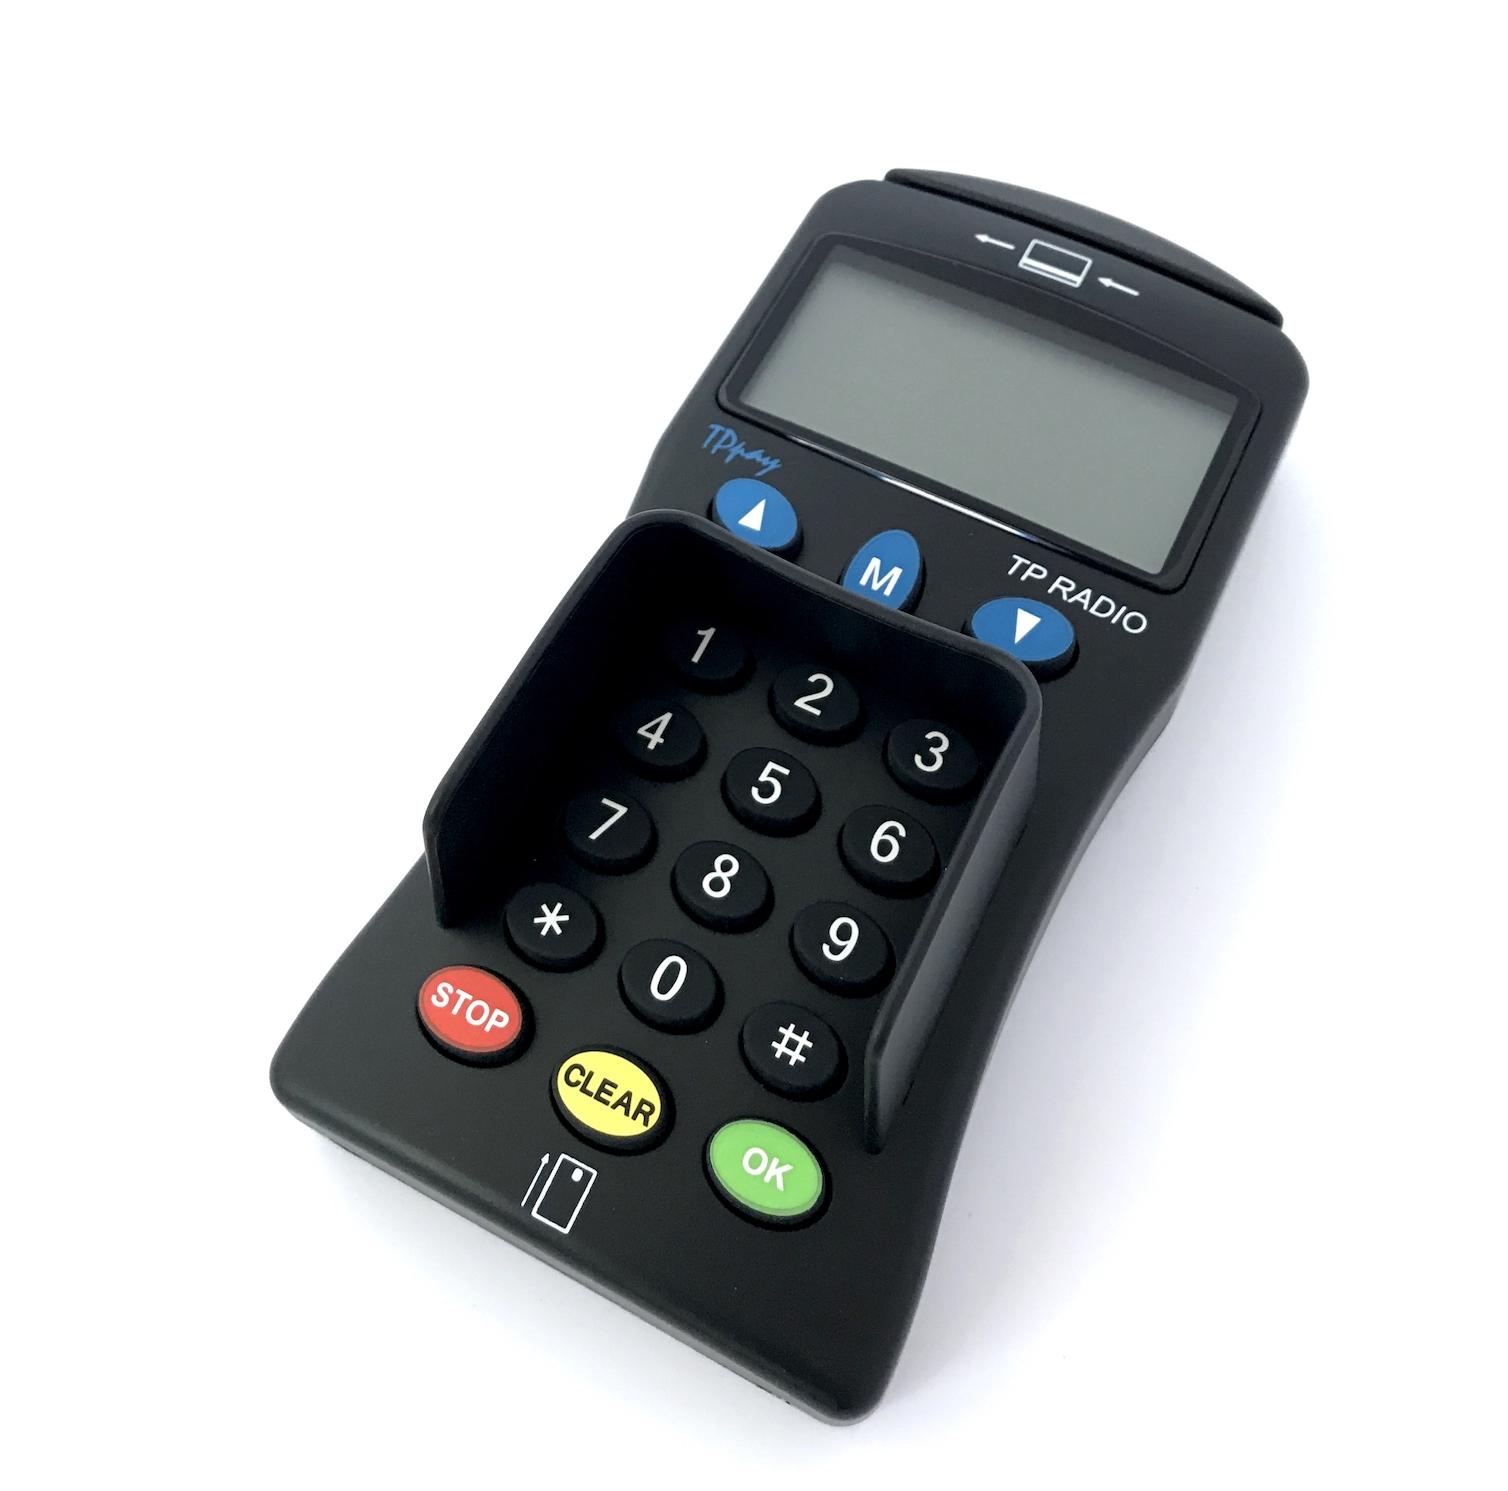 Creditcard reader